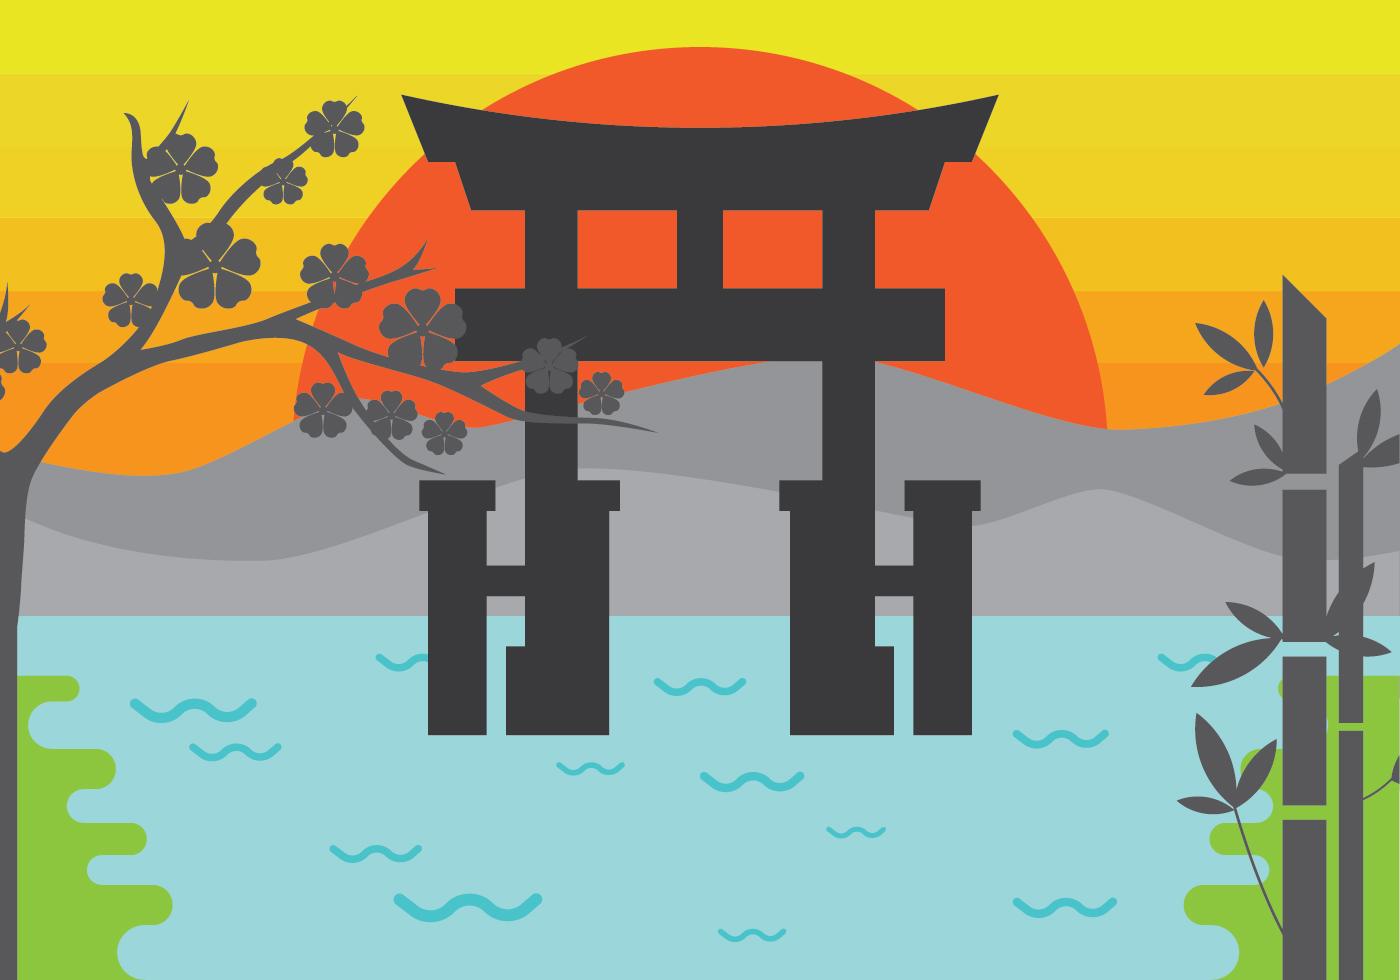 Free Illustration of Torii Gate - Download Free Vector Art ...